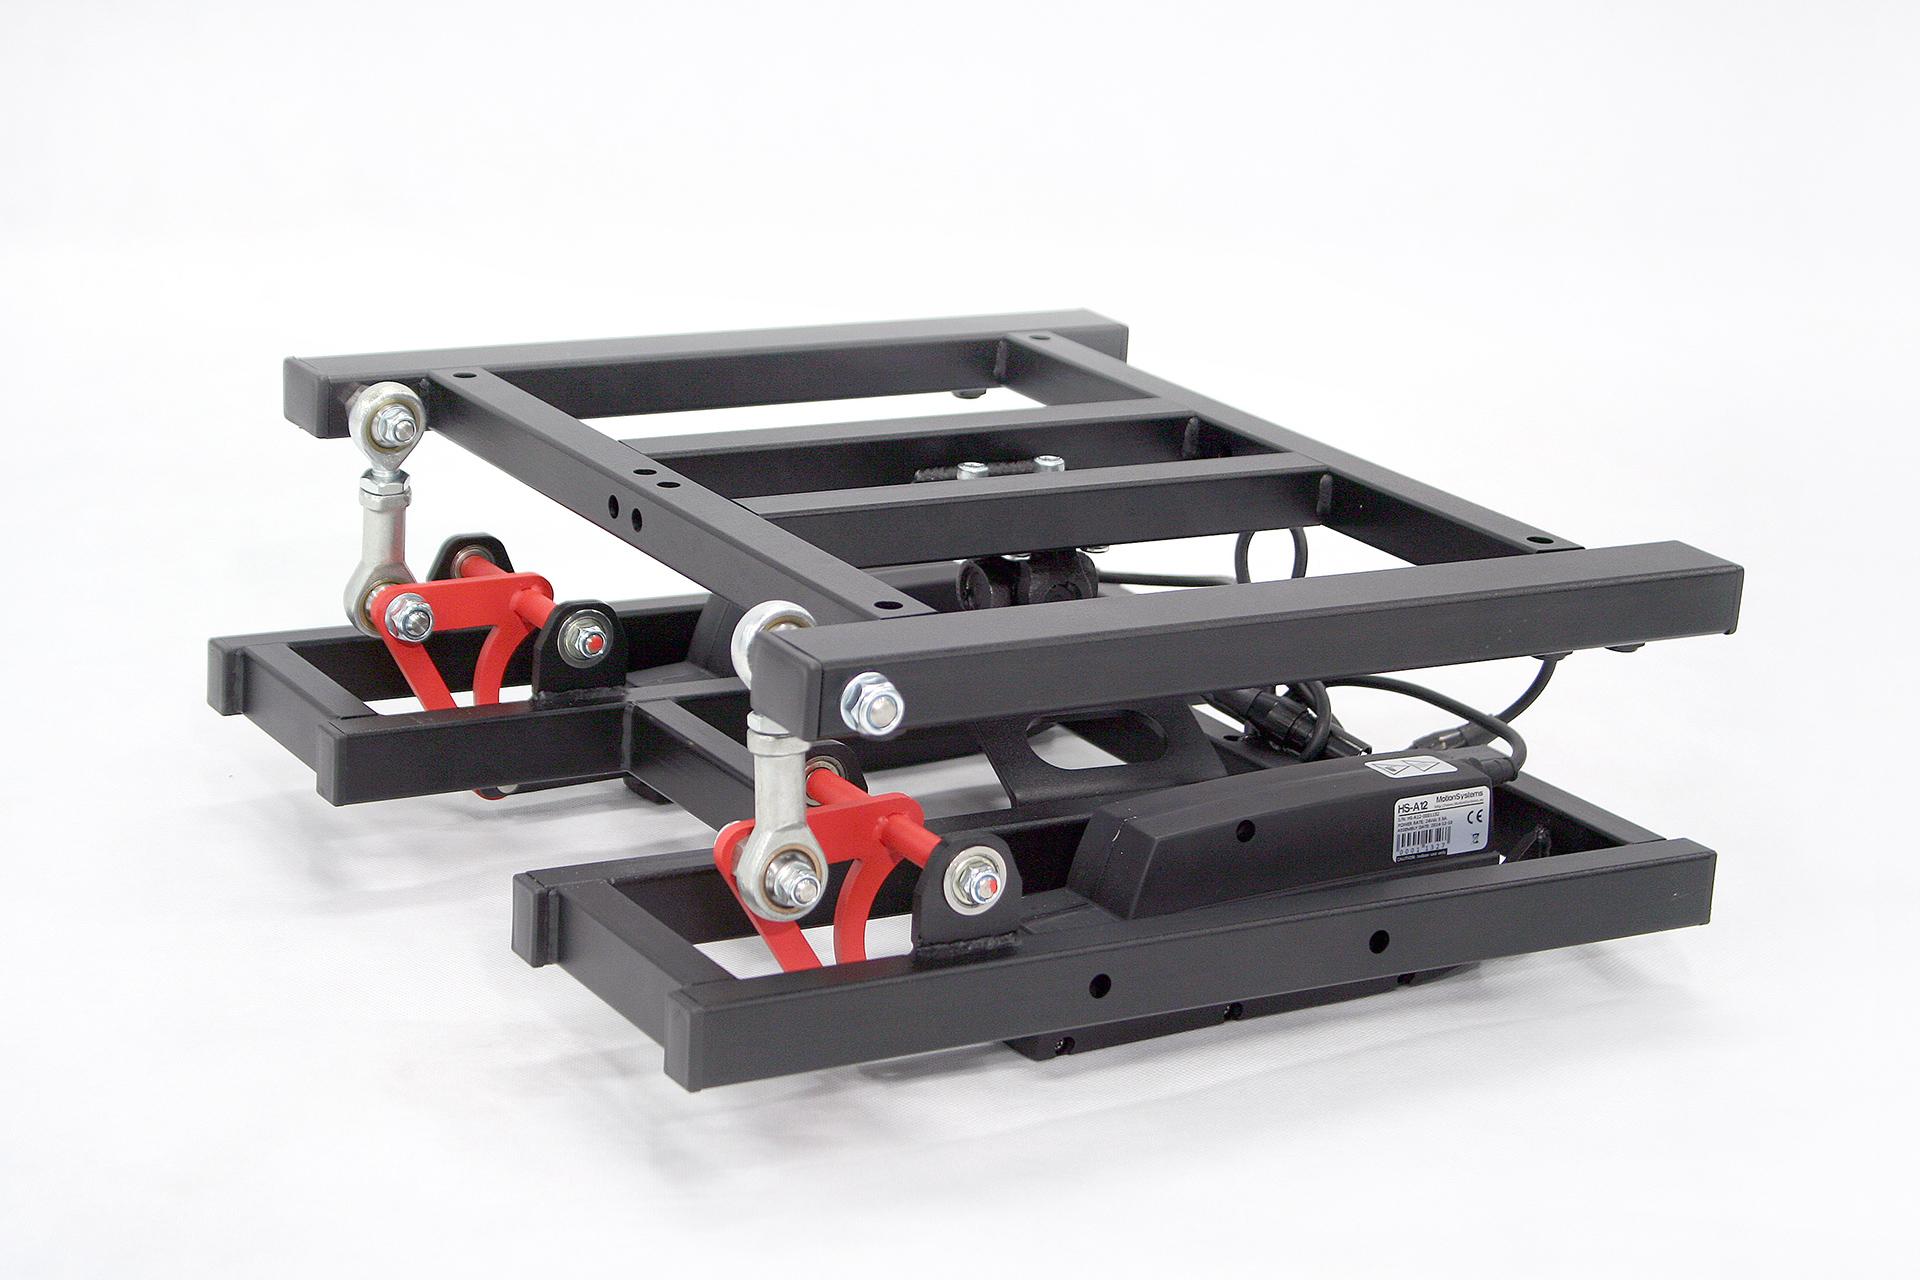 Hs201 2dof Motion Platform A Compact Solution Designed